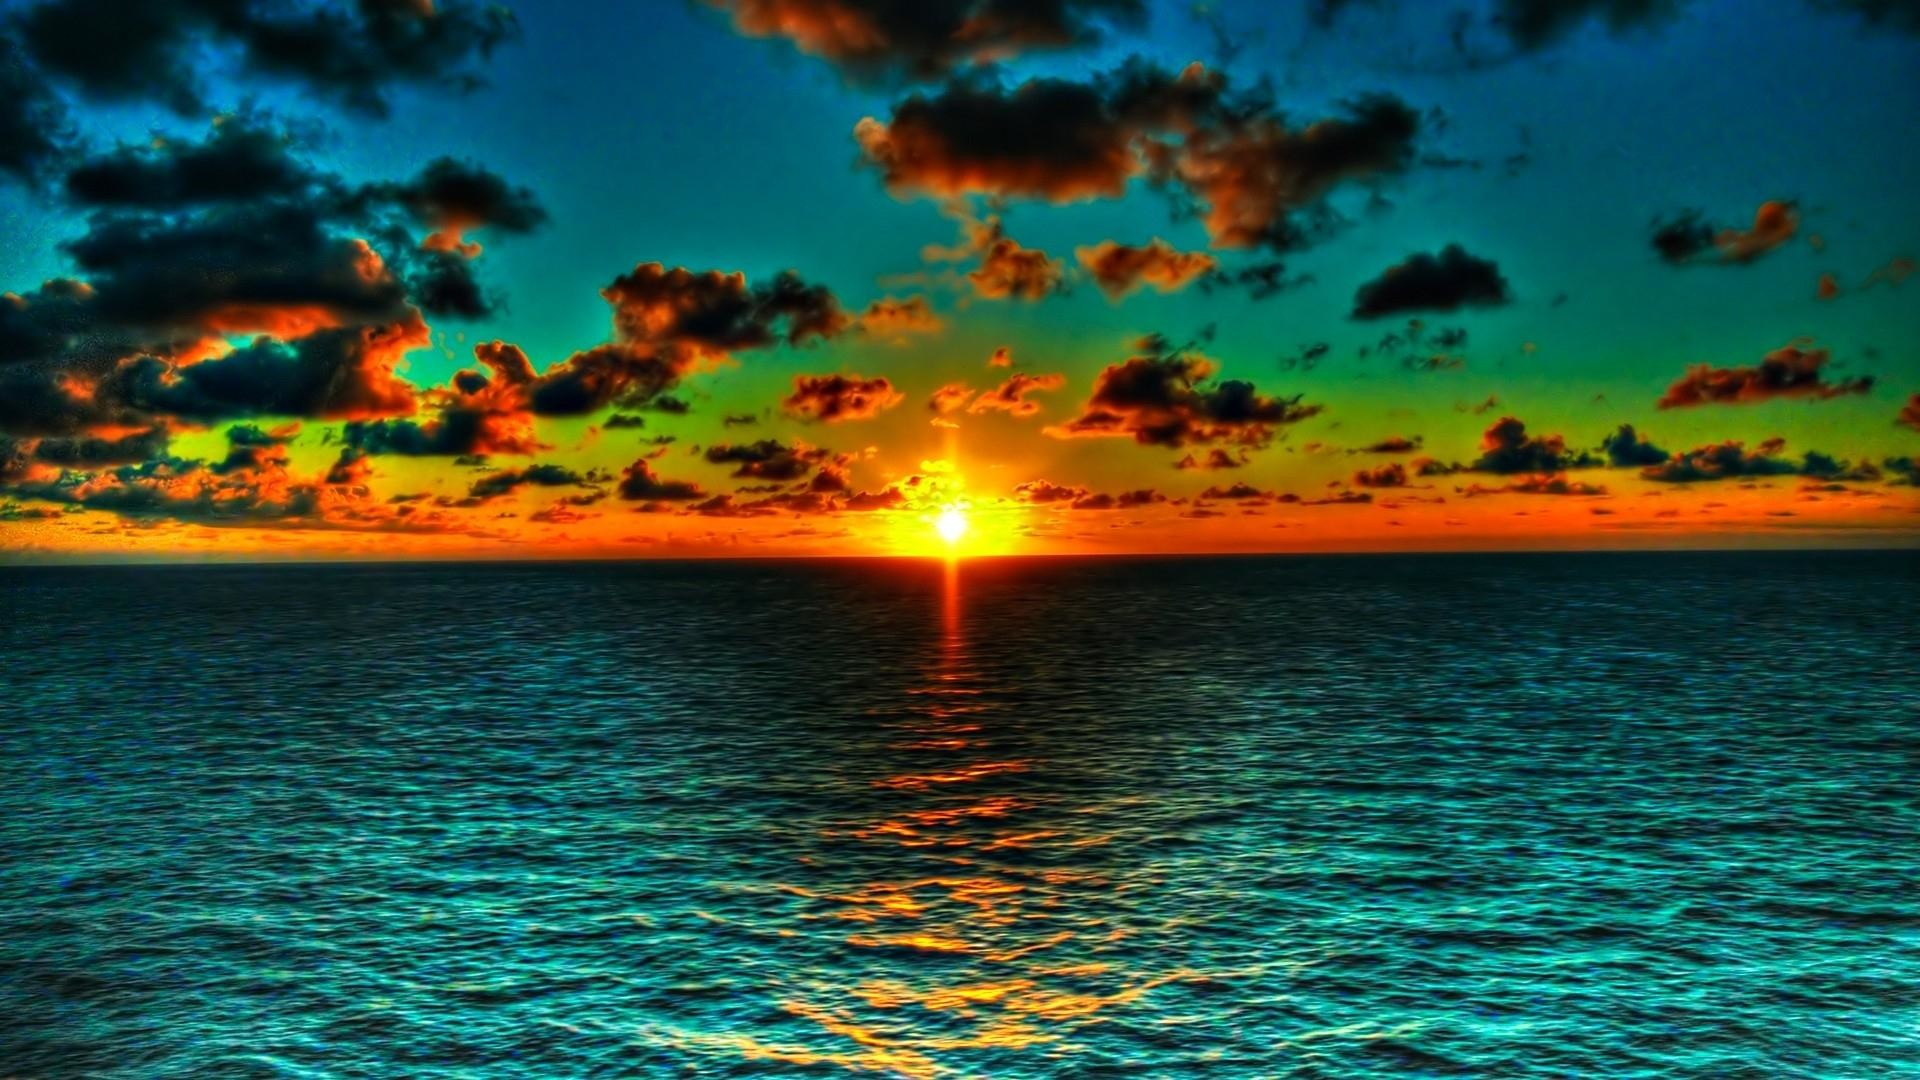 Sunset Desktop Backgrounds 67 Pictures